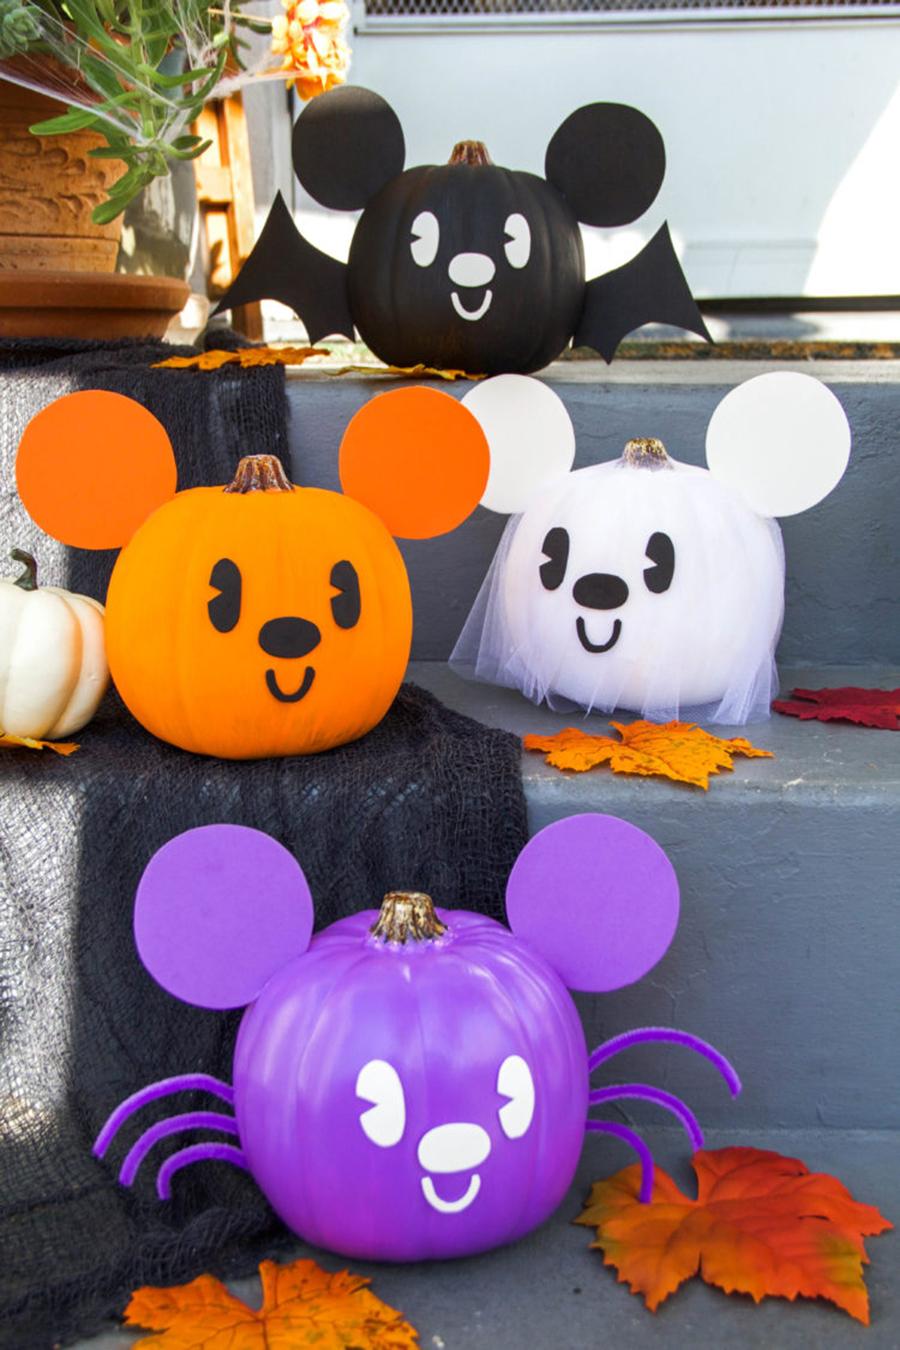 хэллоуин 2020 тыква черная летучая мышь